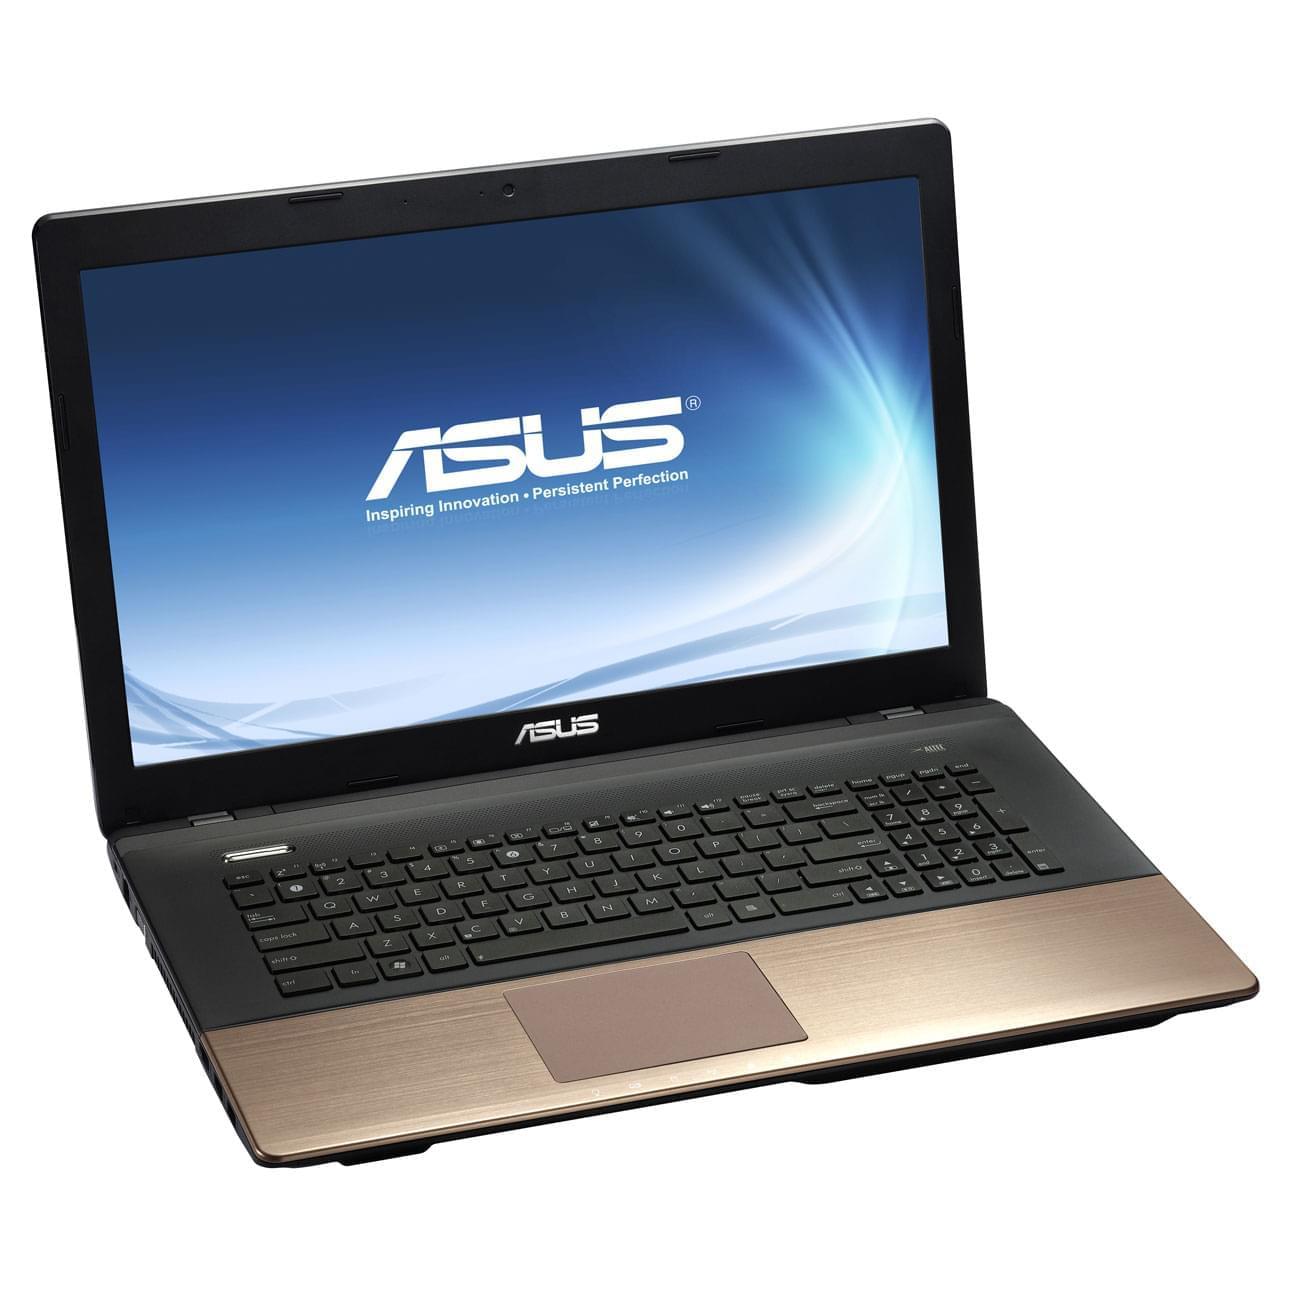 Asus K75VM-TY018V (K75VM-TY018V) - Achat / Vente PC Portable sur Cybertek.fr - 0